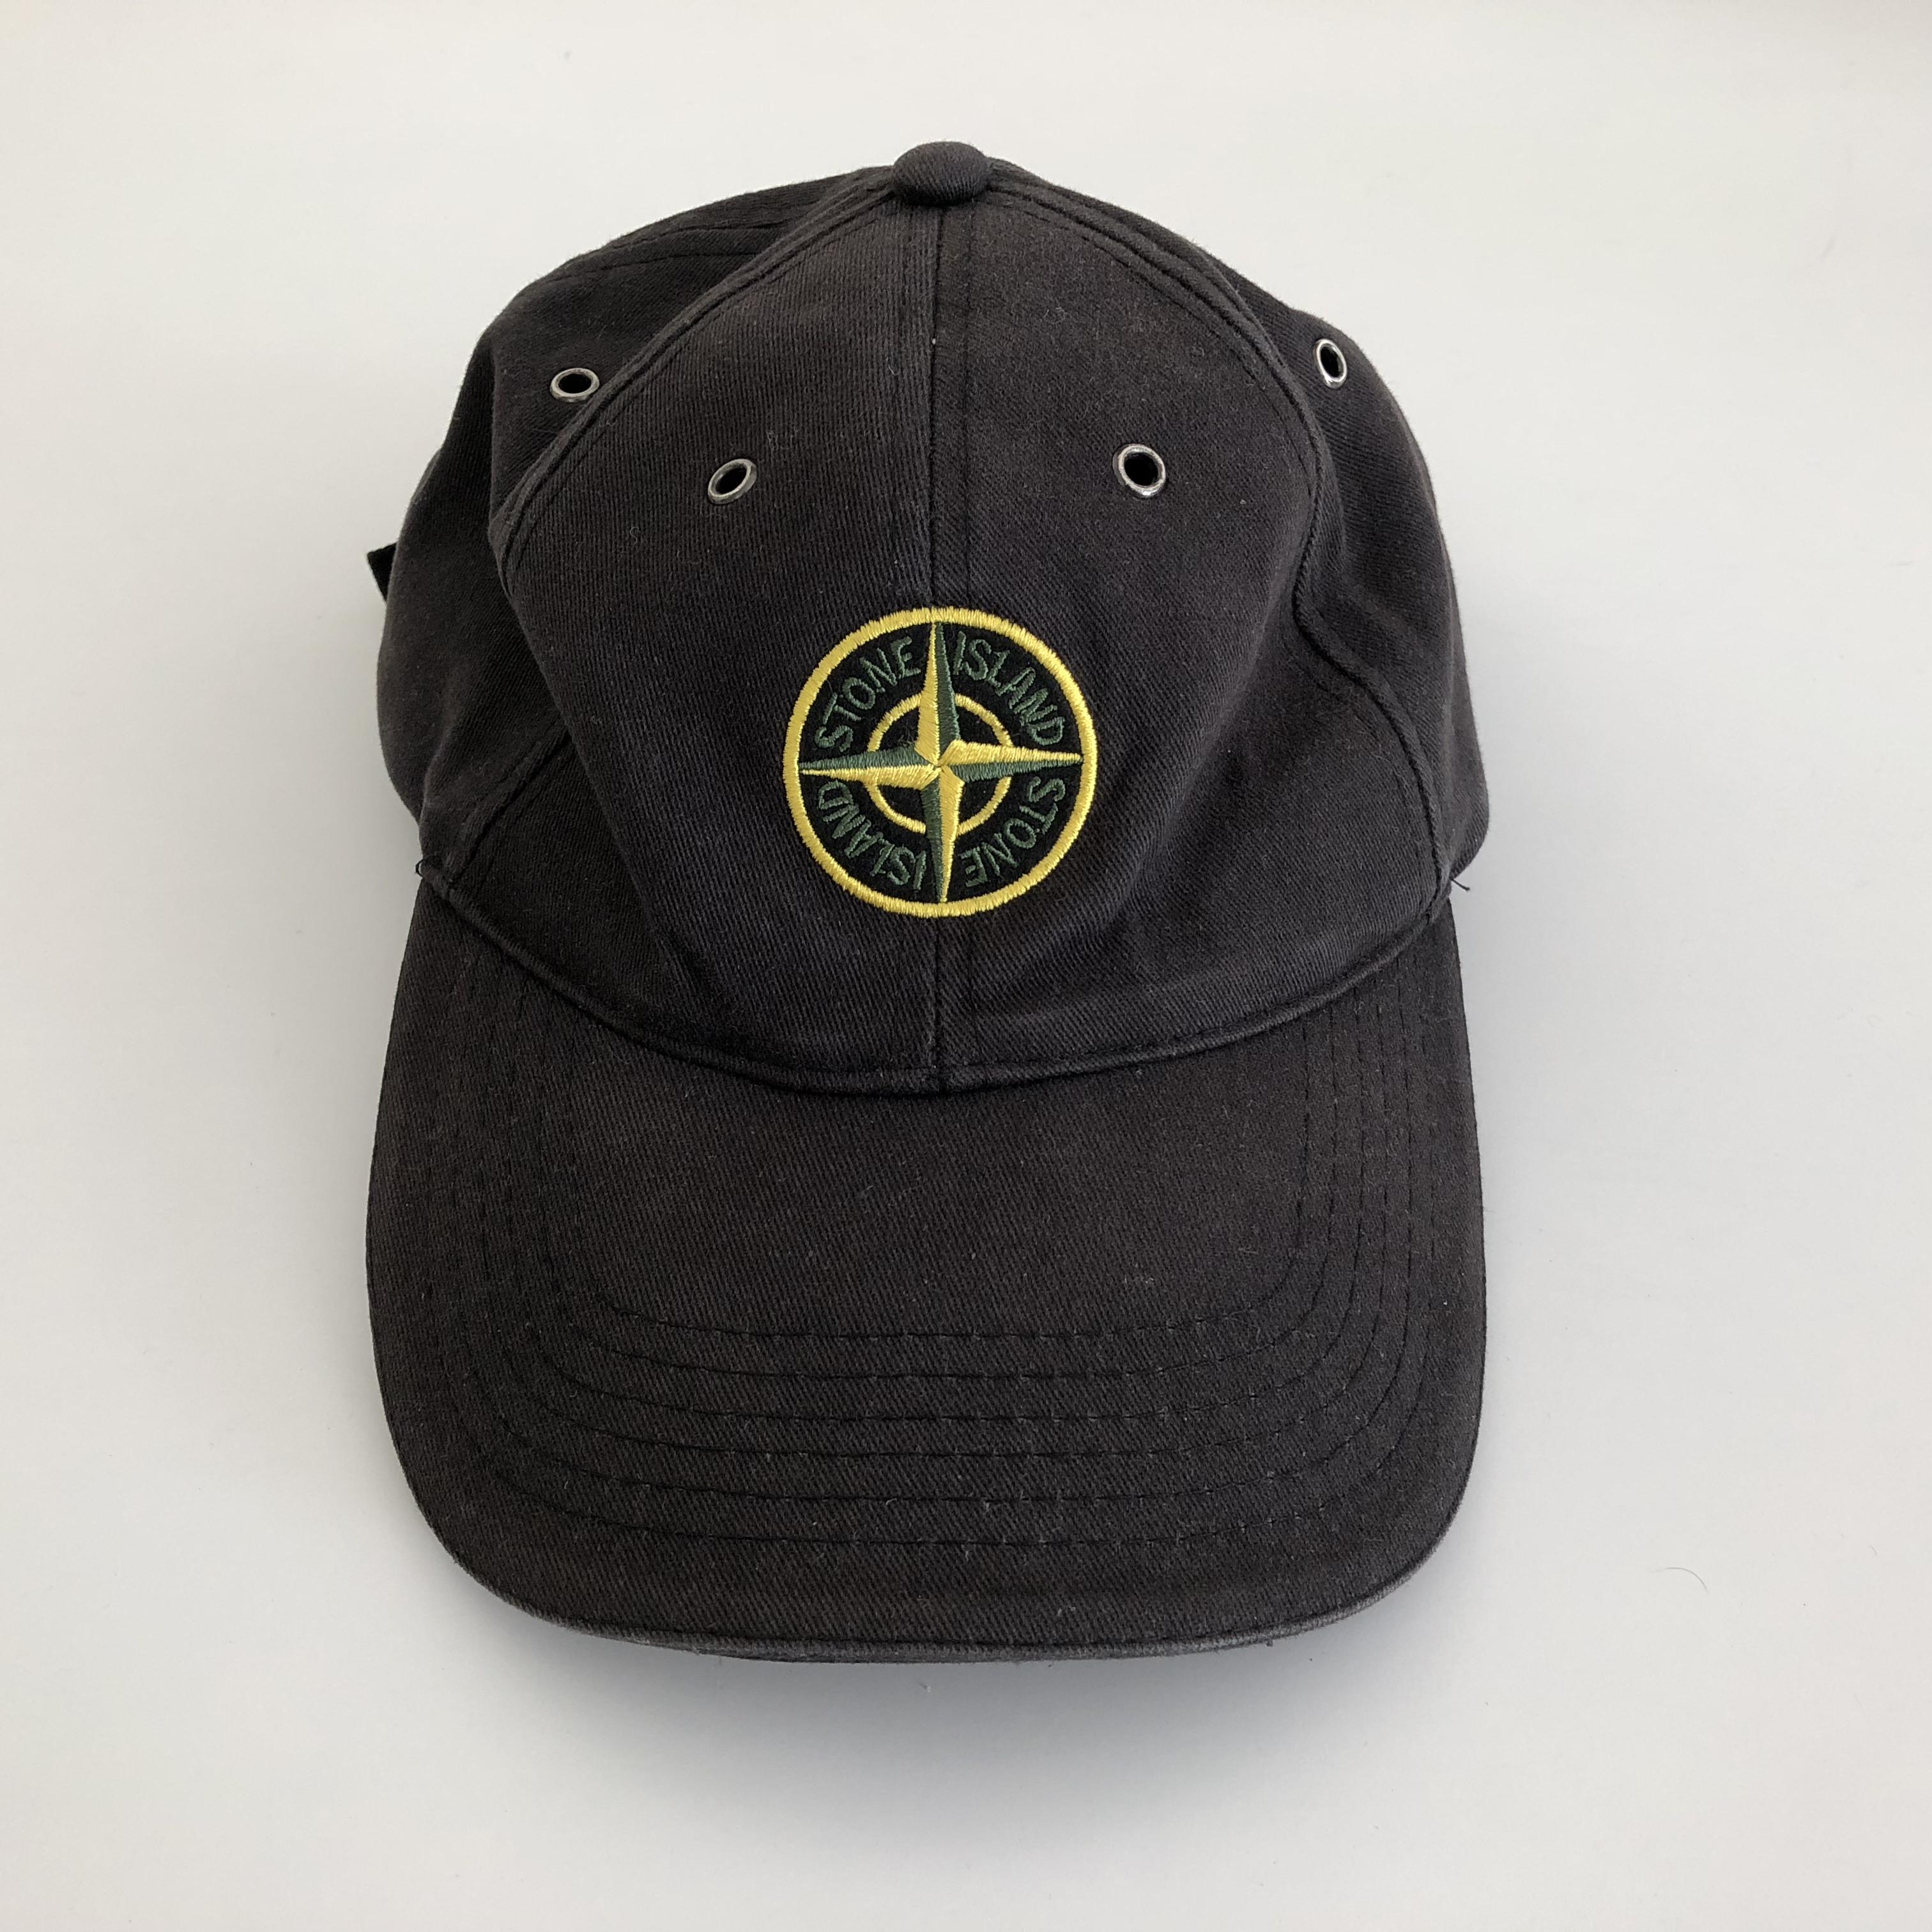 Get 90S Dad Hats Background